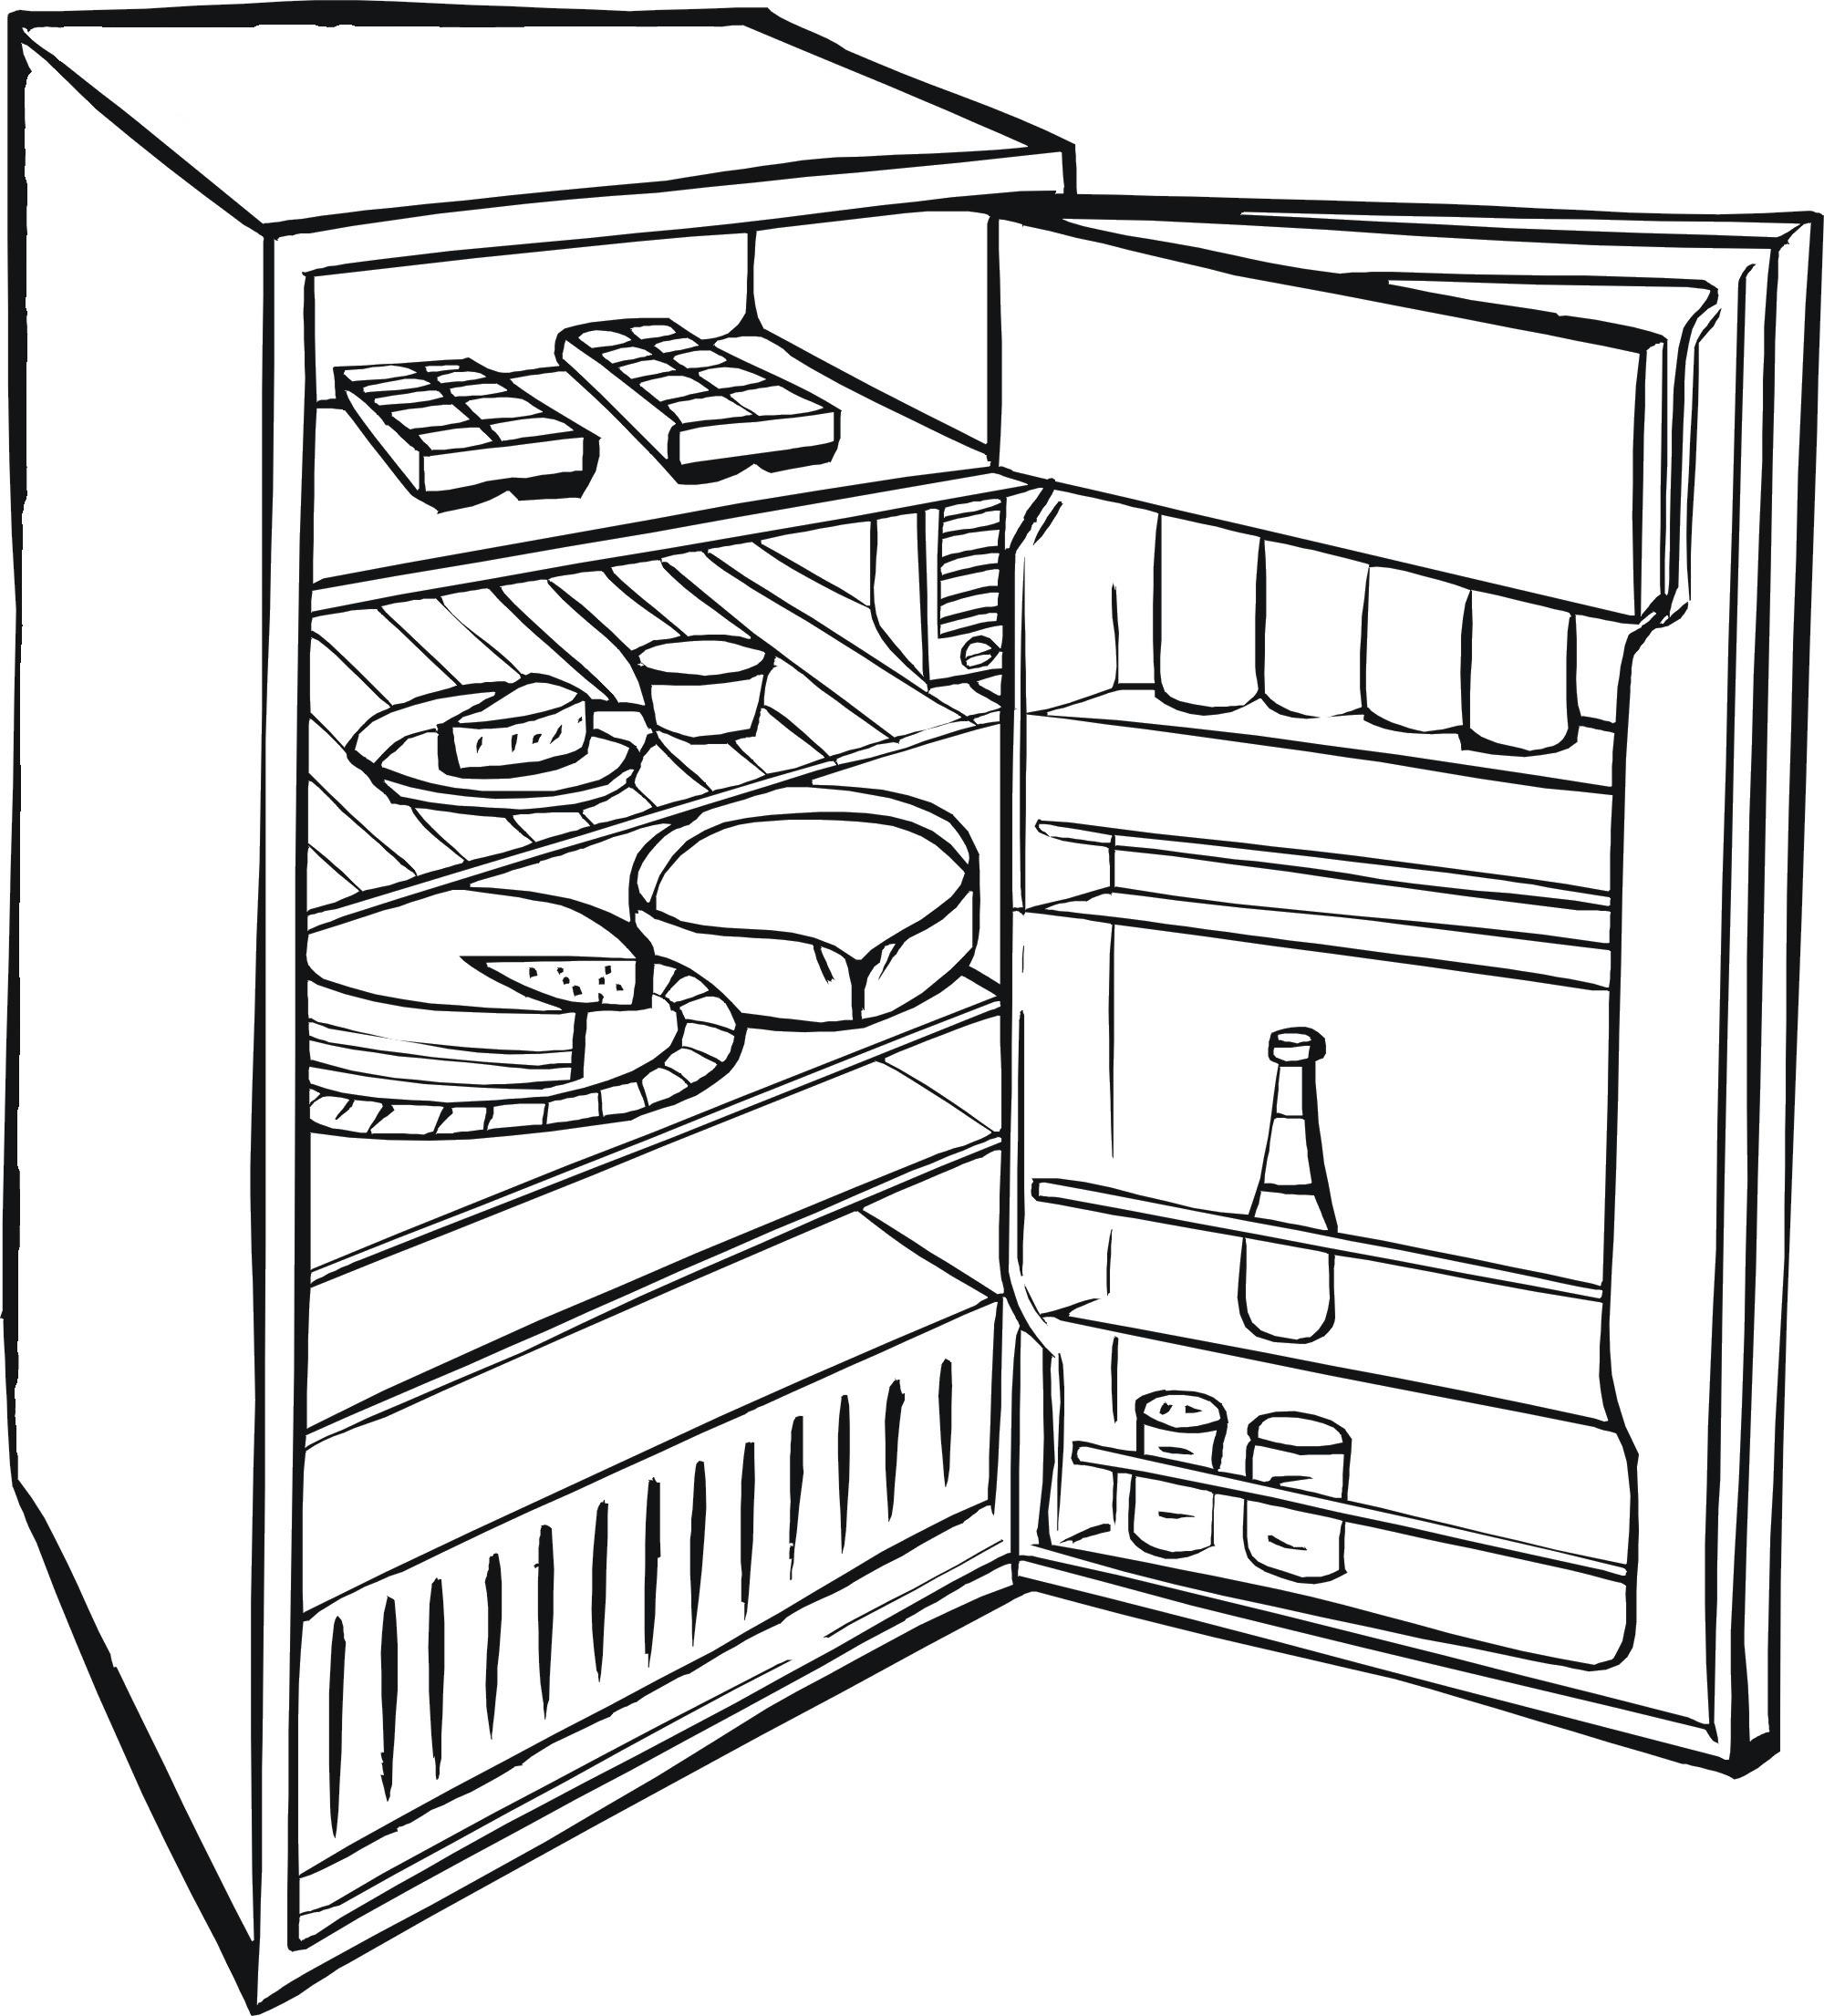 Refrigerator Sketch At Paintingvalley